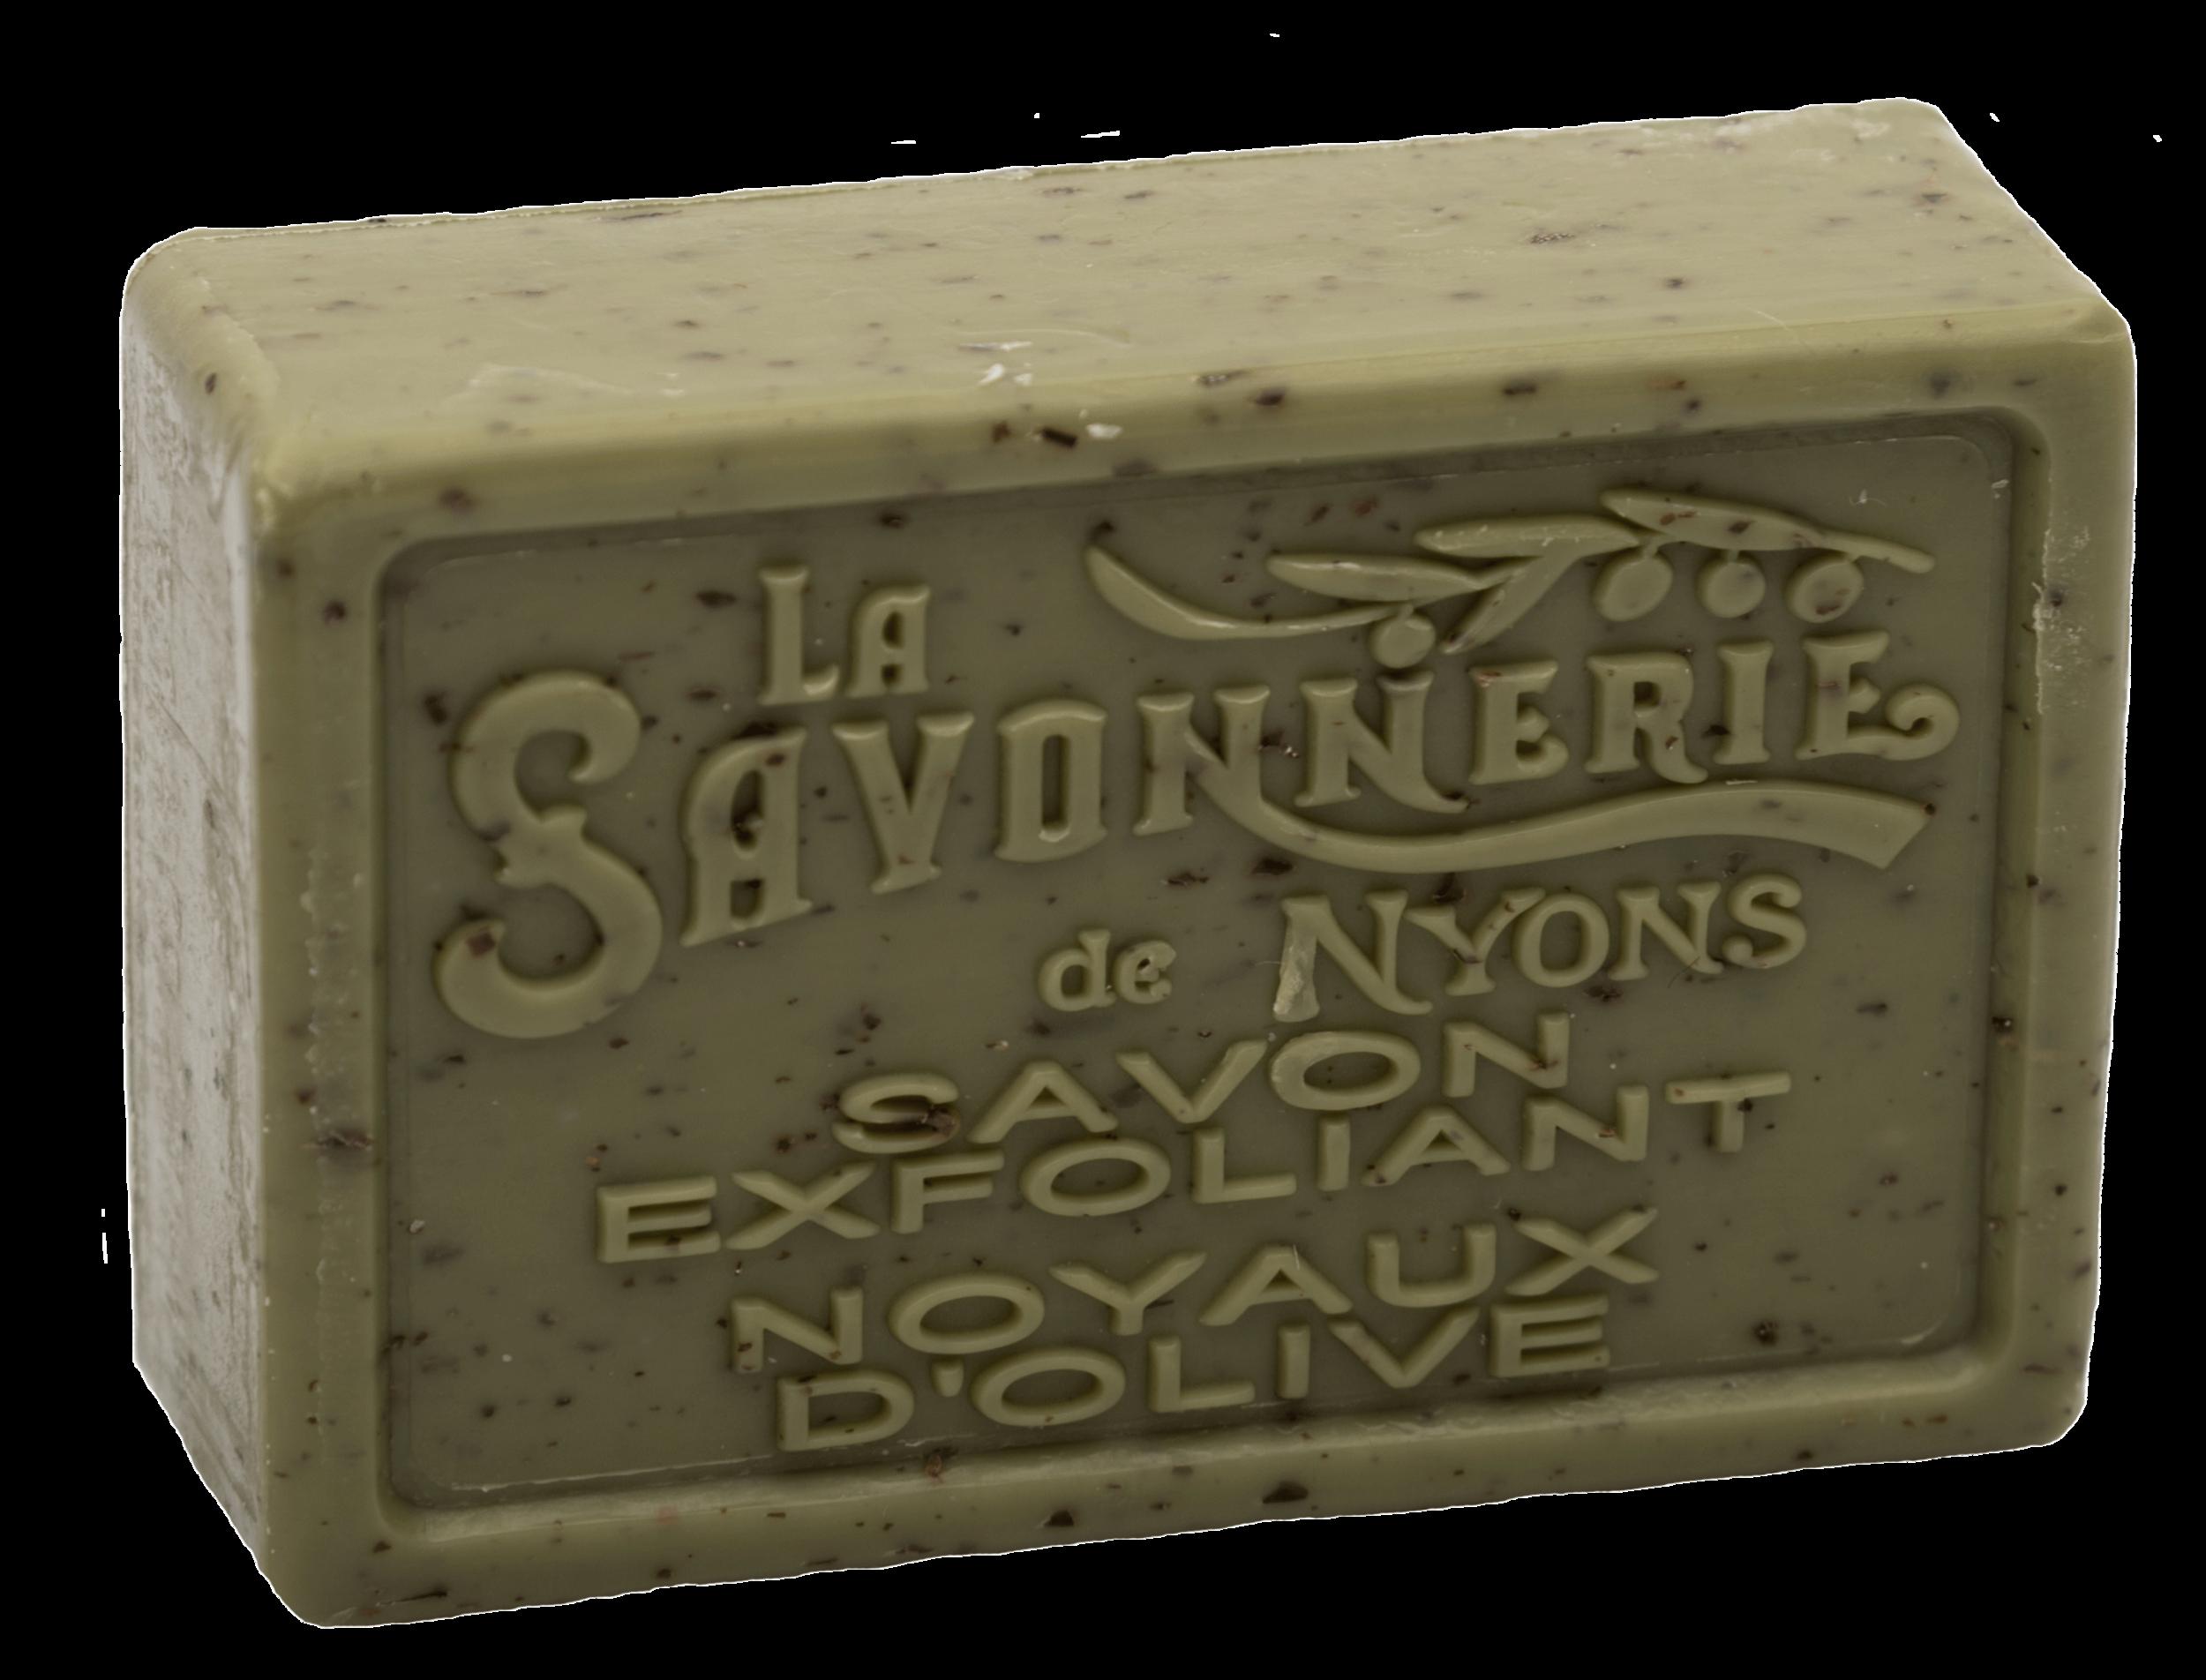 Exfoliant Noyaux d\'Olive 100 g